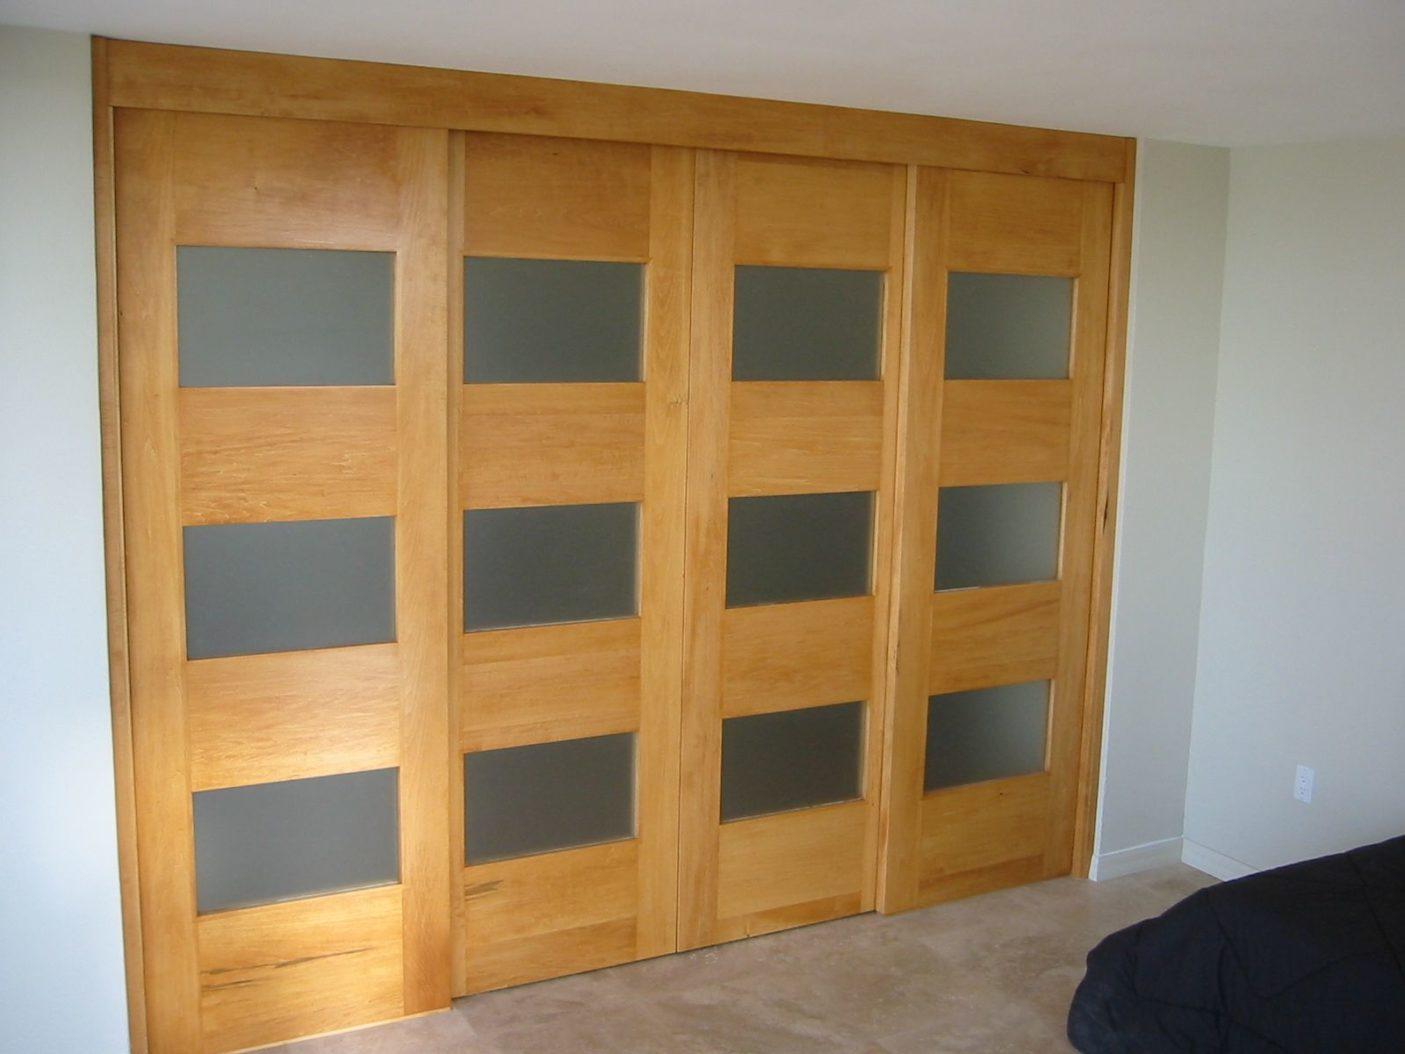 Panels-And-Doors-52.jpg